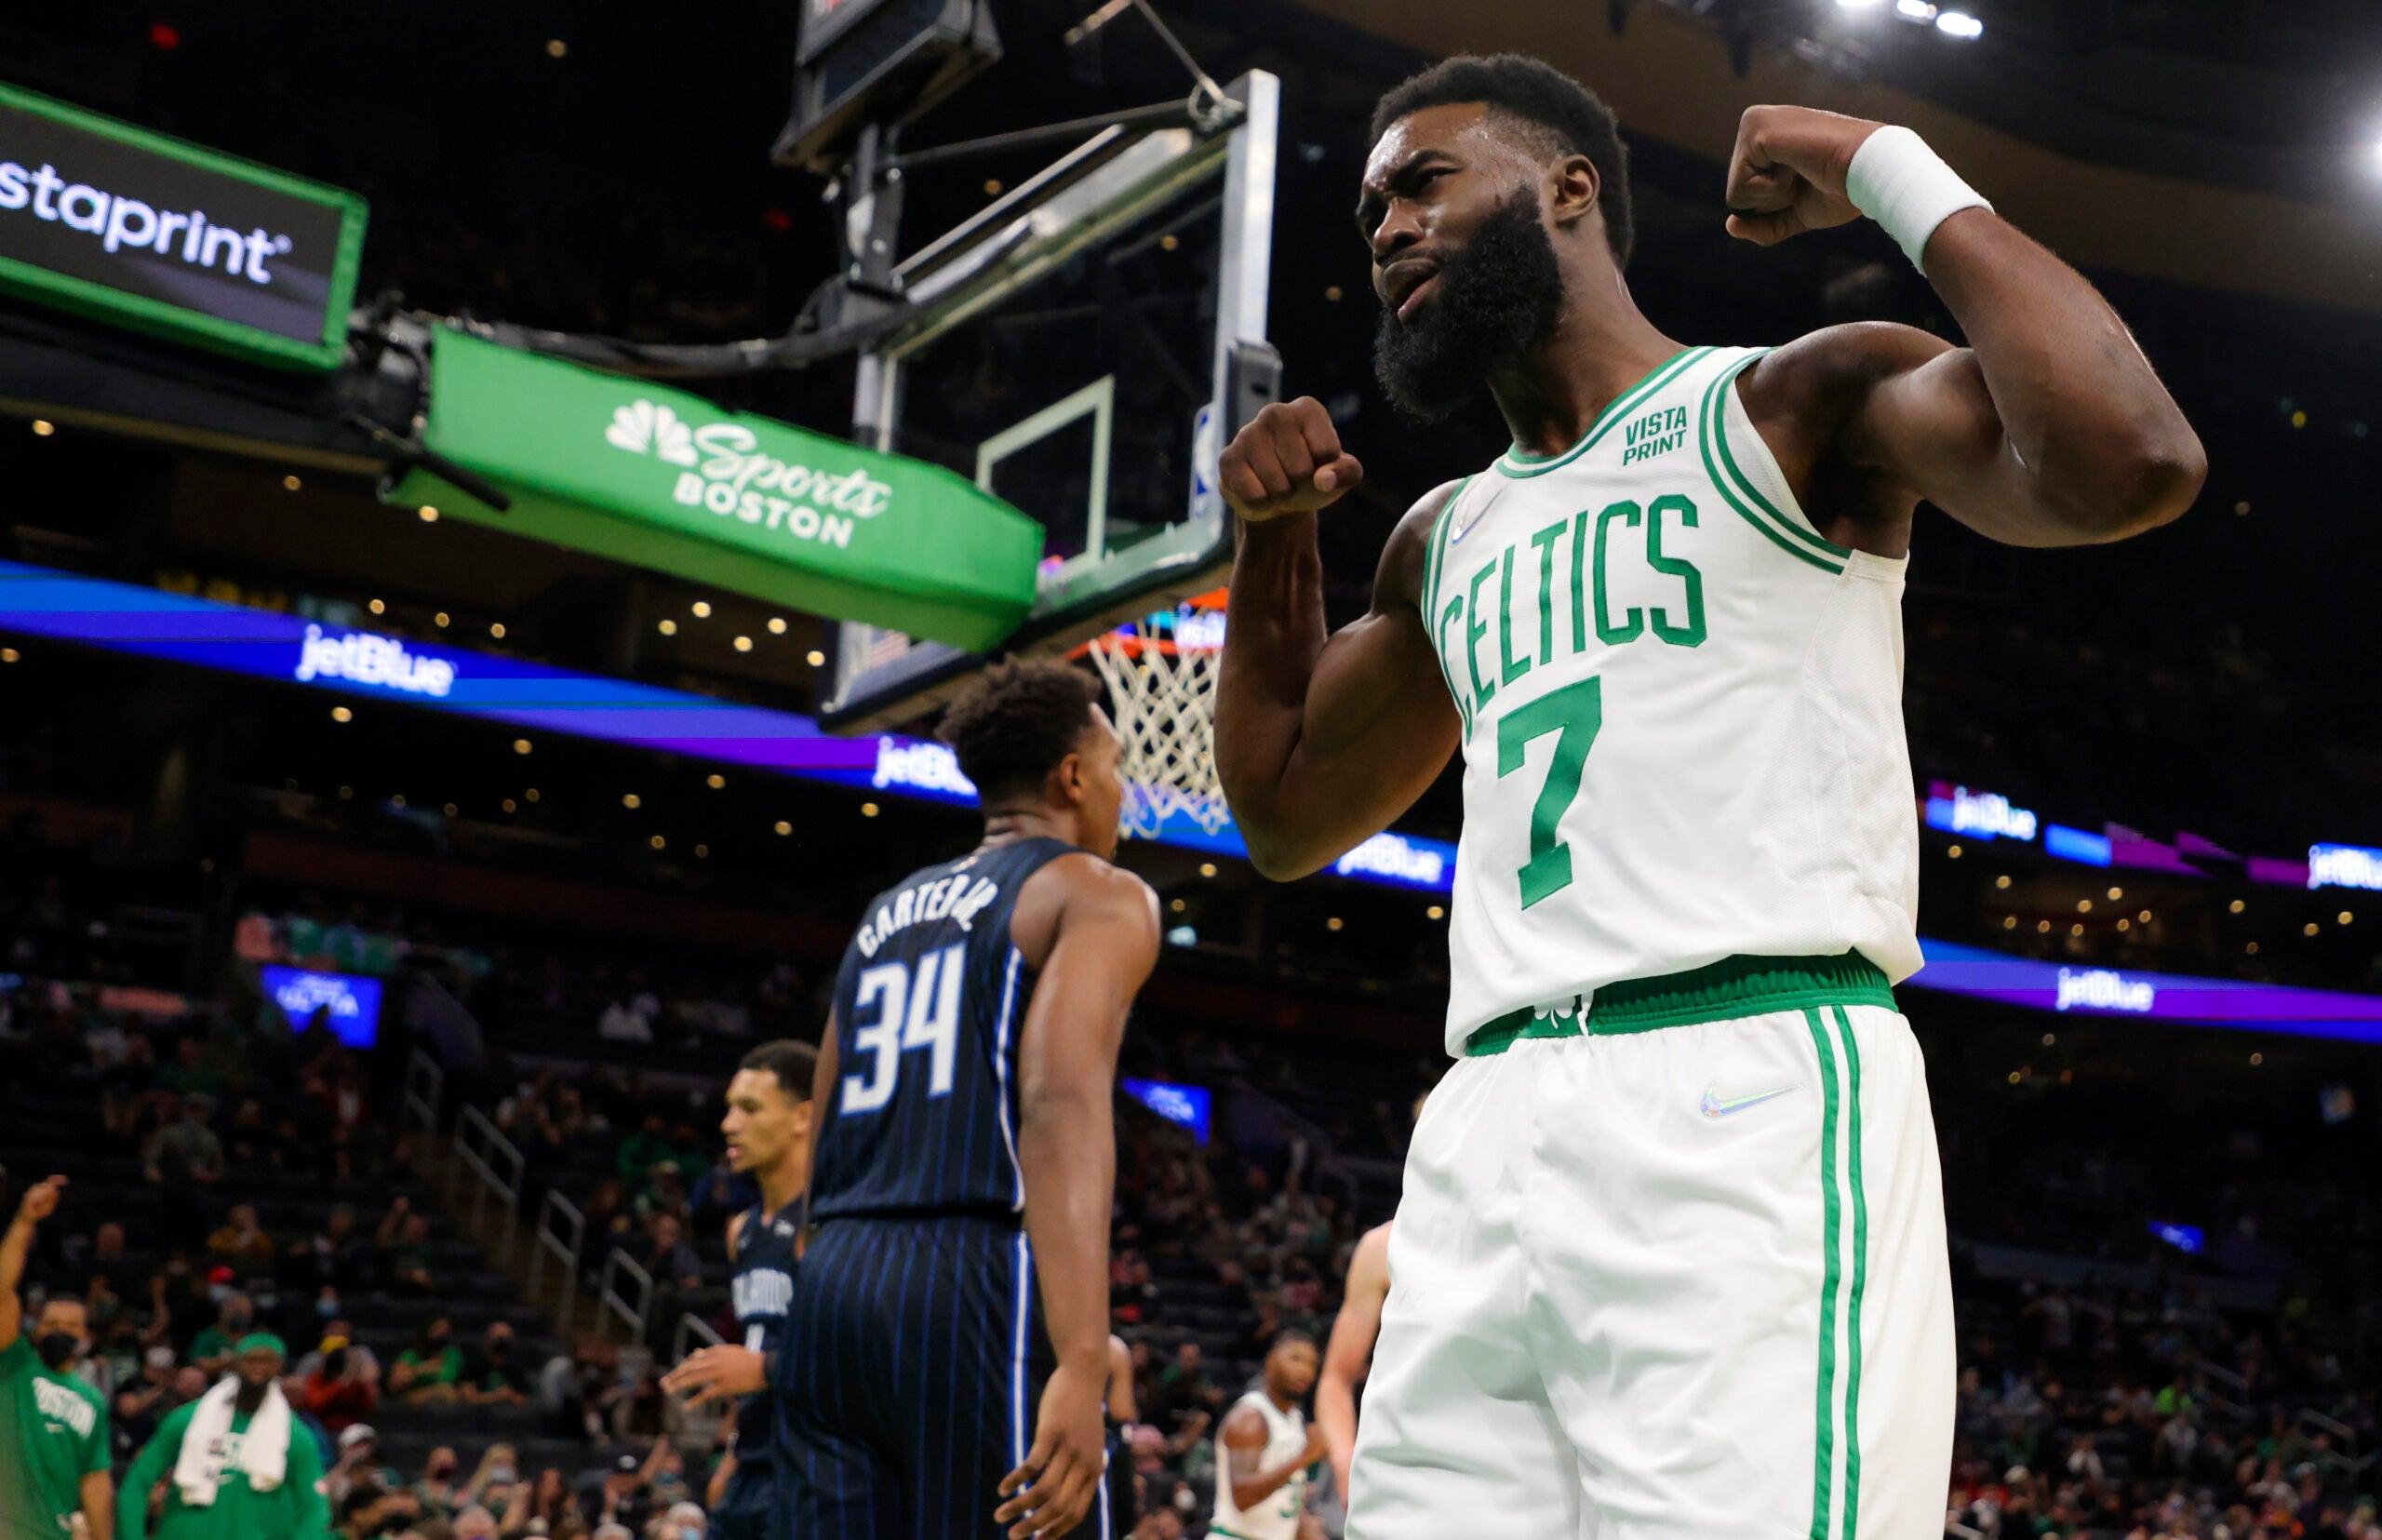 Celtics Magic takeaways